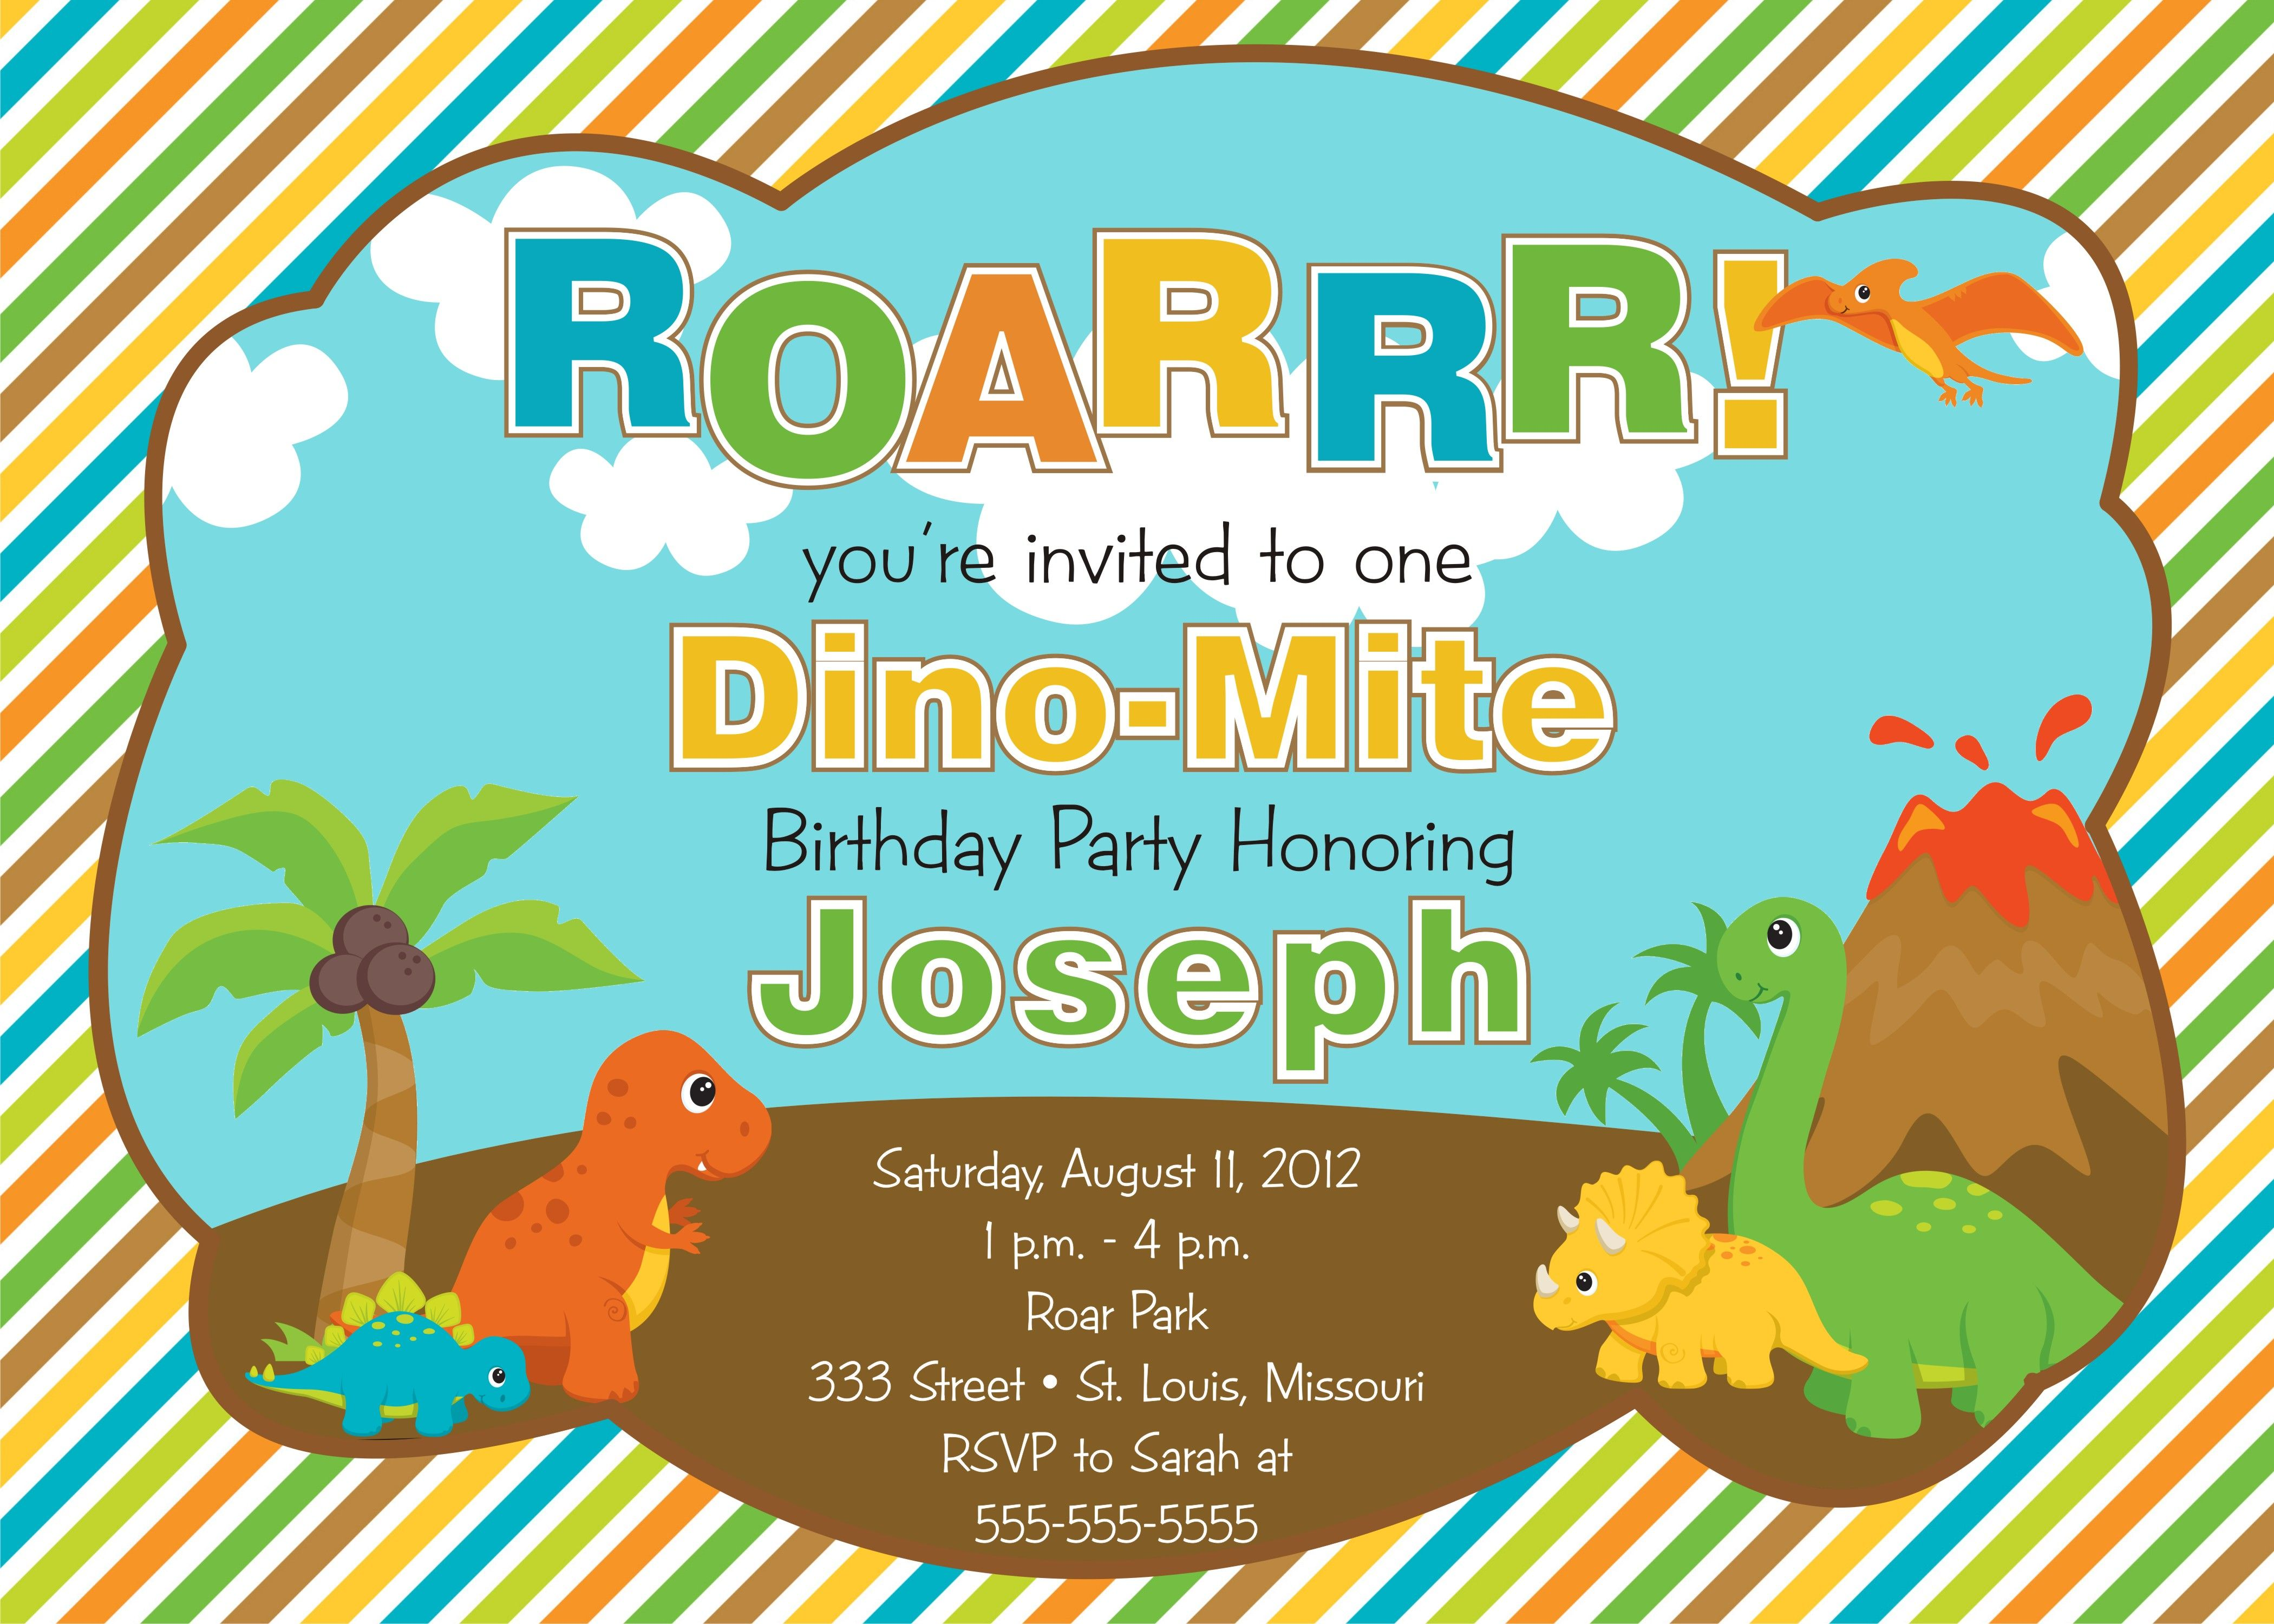 Download Free Template Free Printable Dinosaur Birthday Invitations Dinosaur Birthday Party Invitations Dinosaur Birthday Invitations Party Invite Template